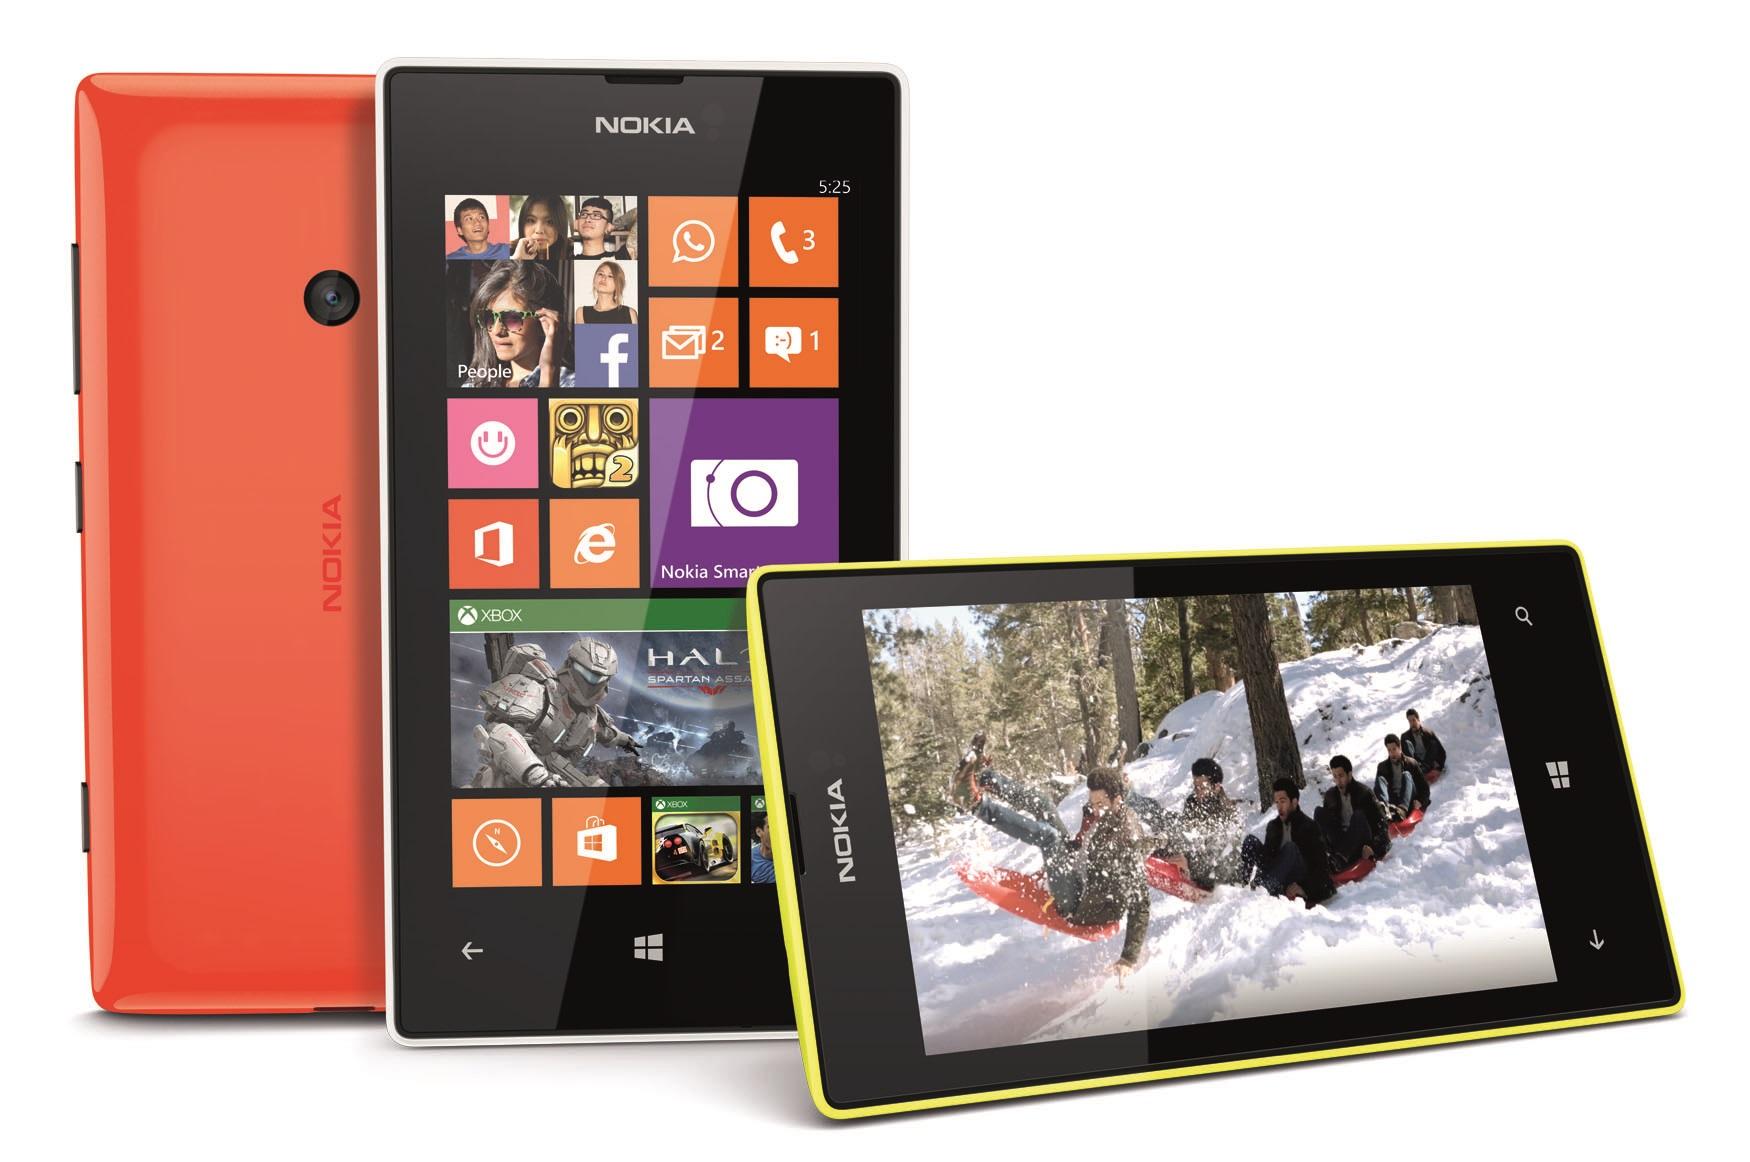 Nokia Lumia 525 image 1